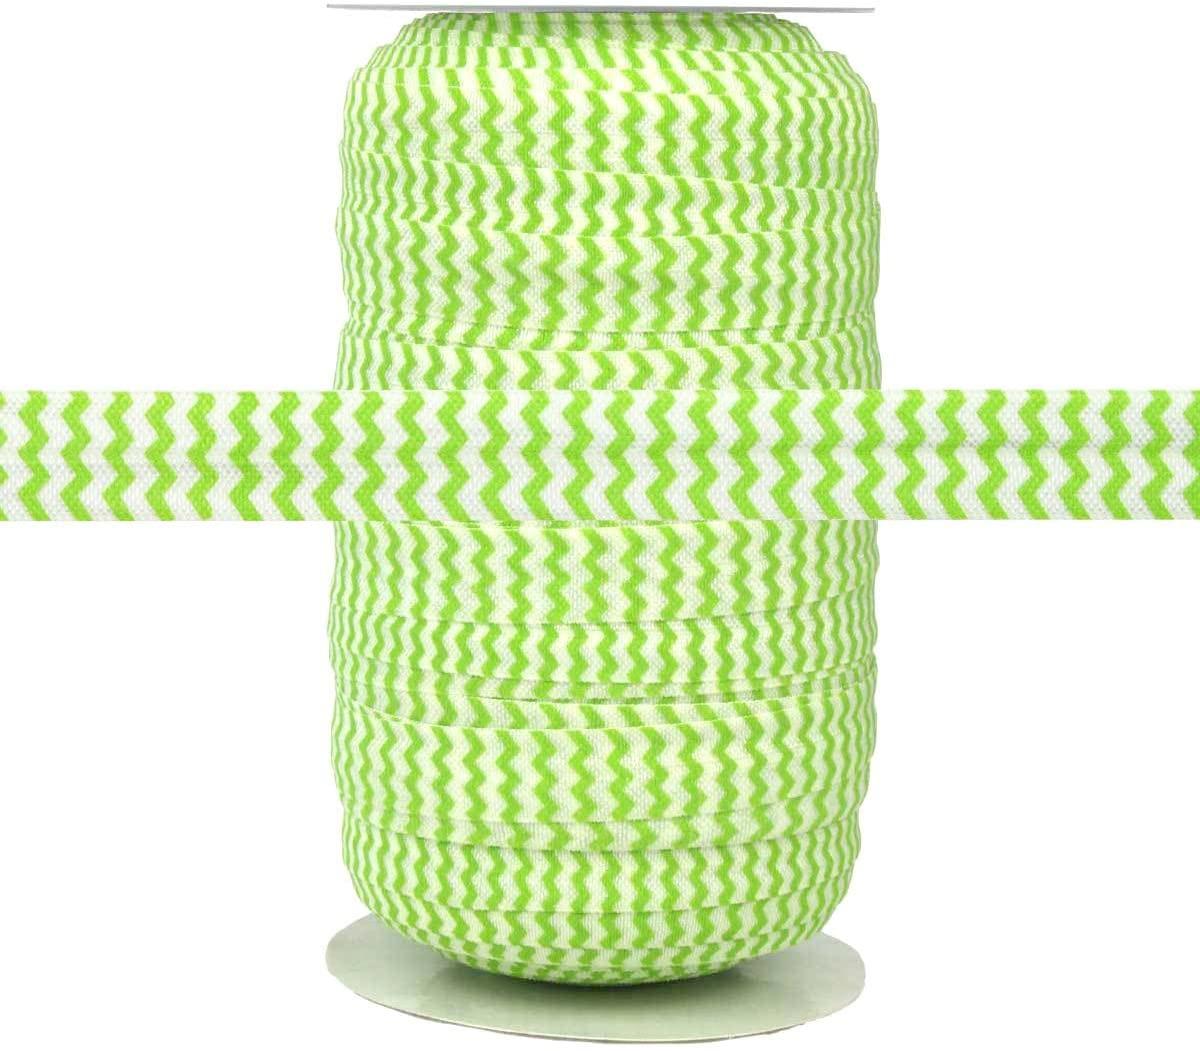 100 Yards - Lime Chevron on White - 5/8 Fold Over Elastic - ElasticByTheYard